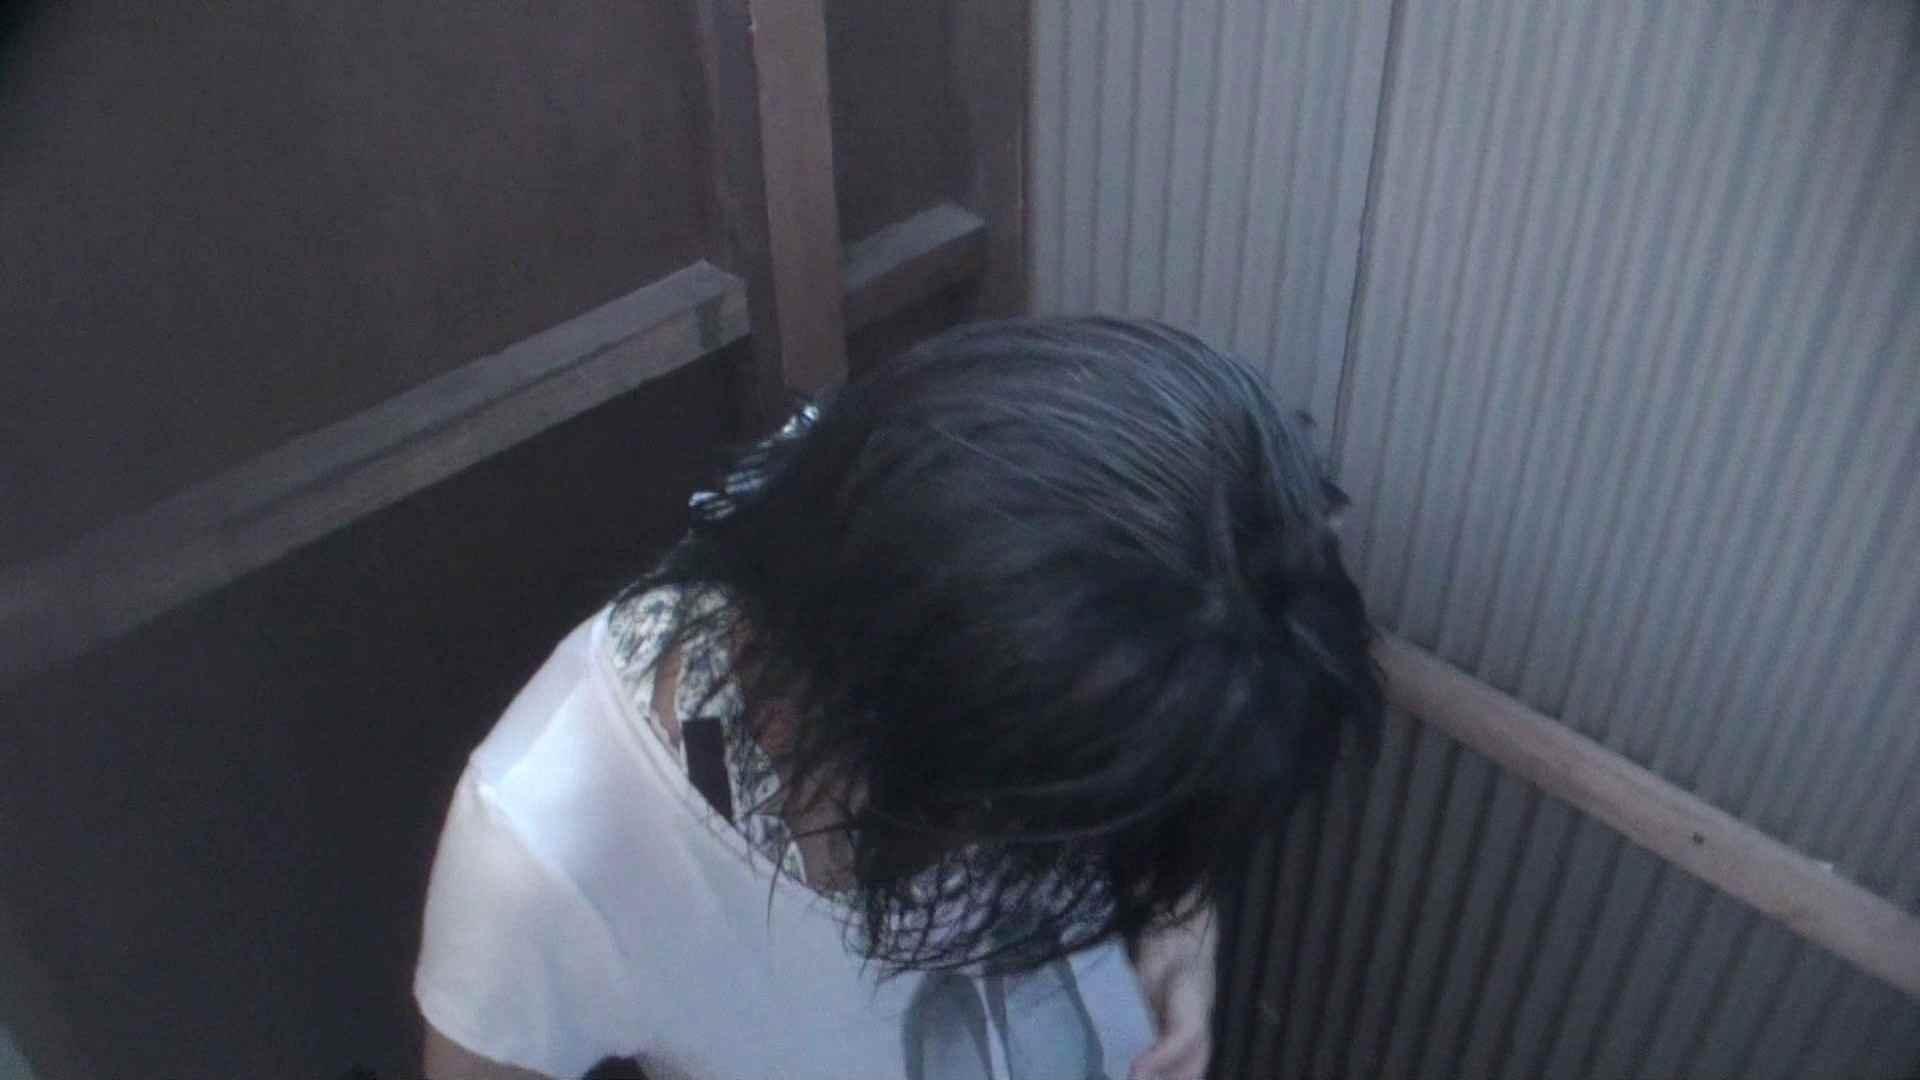 Vol.24 再登場 生理中の年齢不詳嬢 桃色シャワー   盗撮  68pic 13